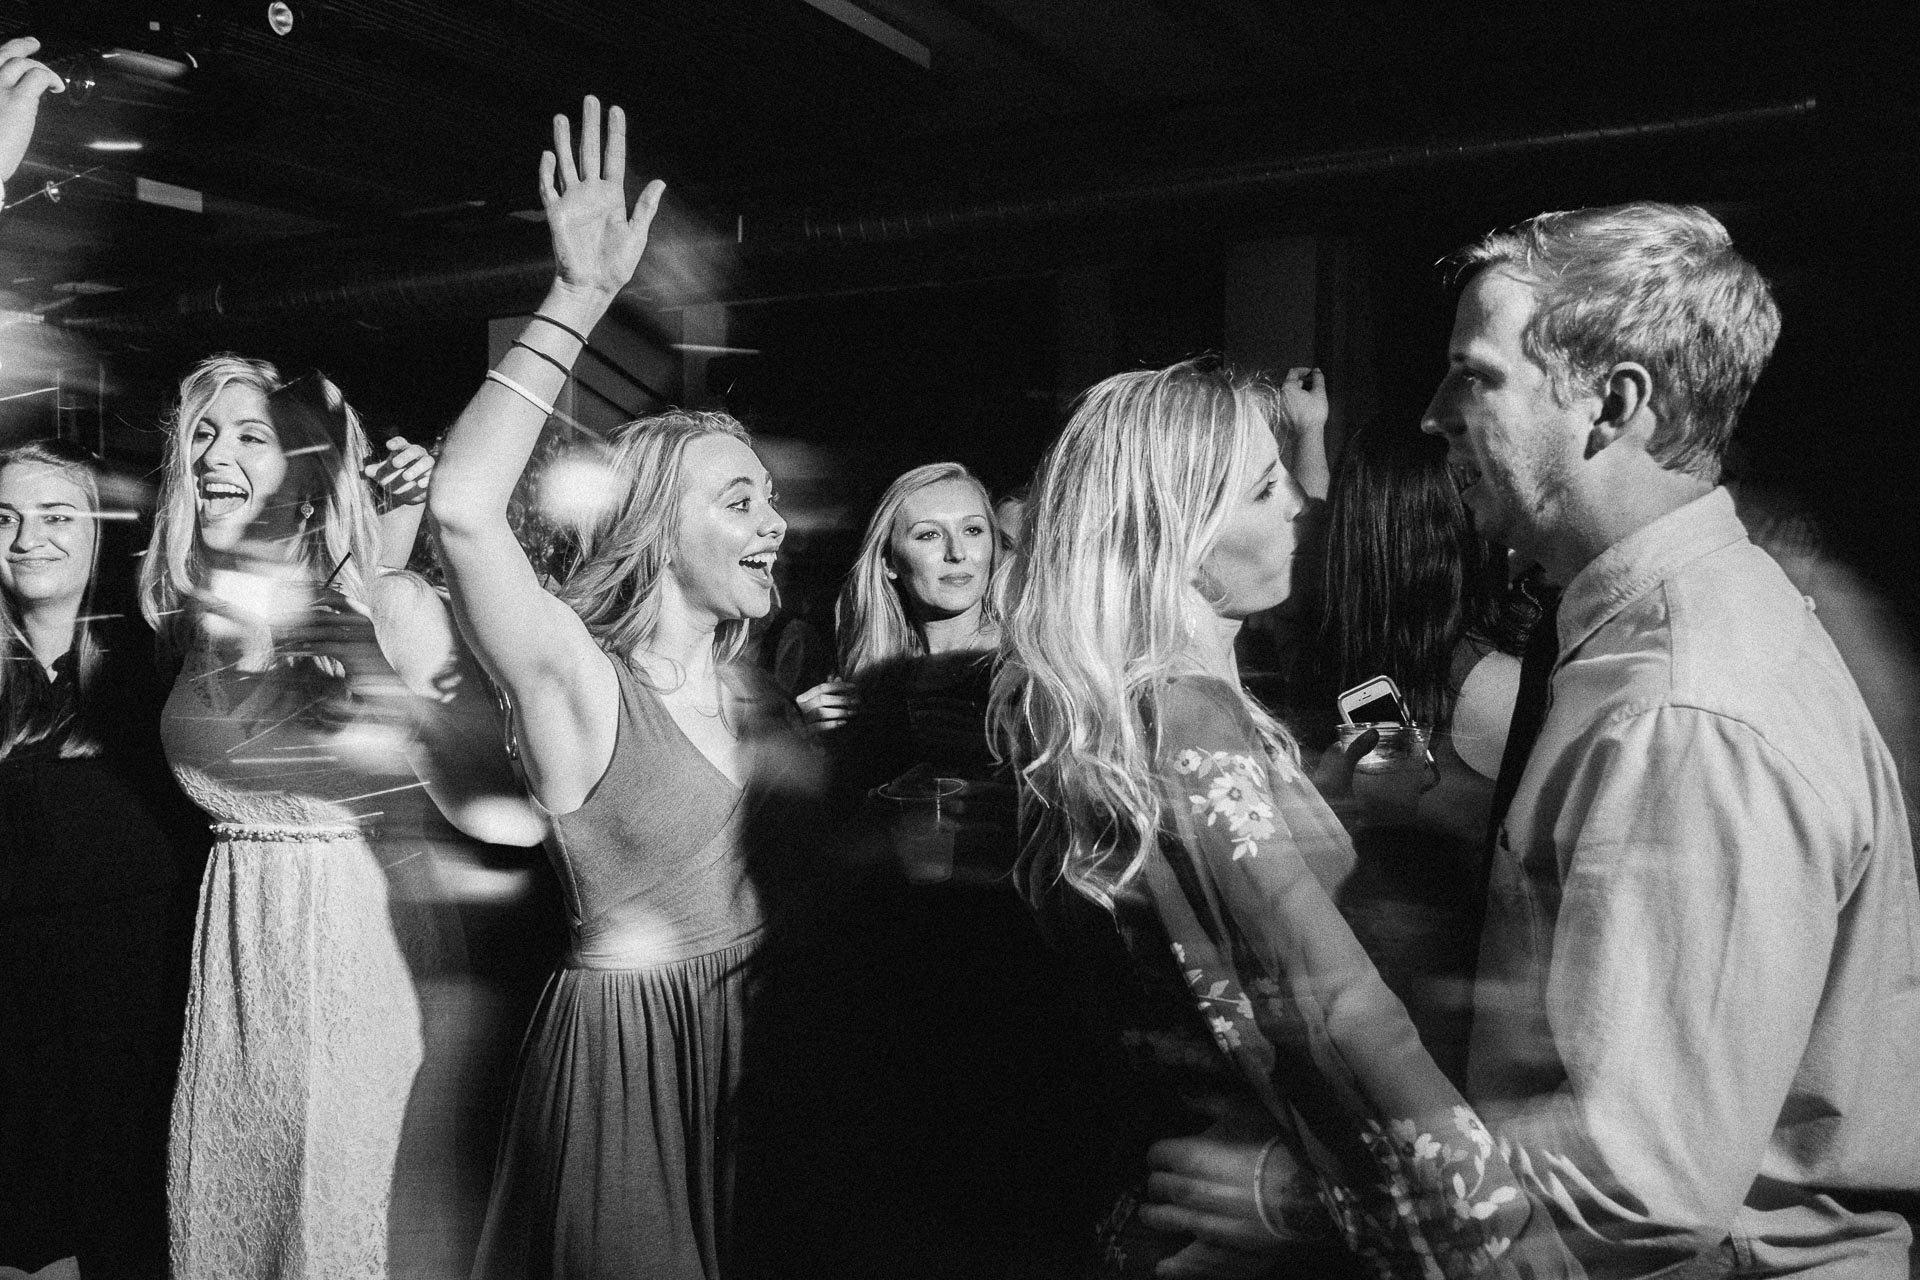 minneapolis-wedding-photographer-a-mill-artist-lofts0030